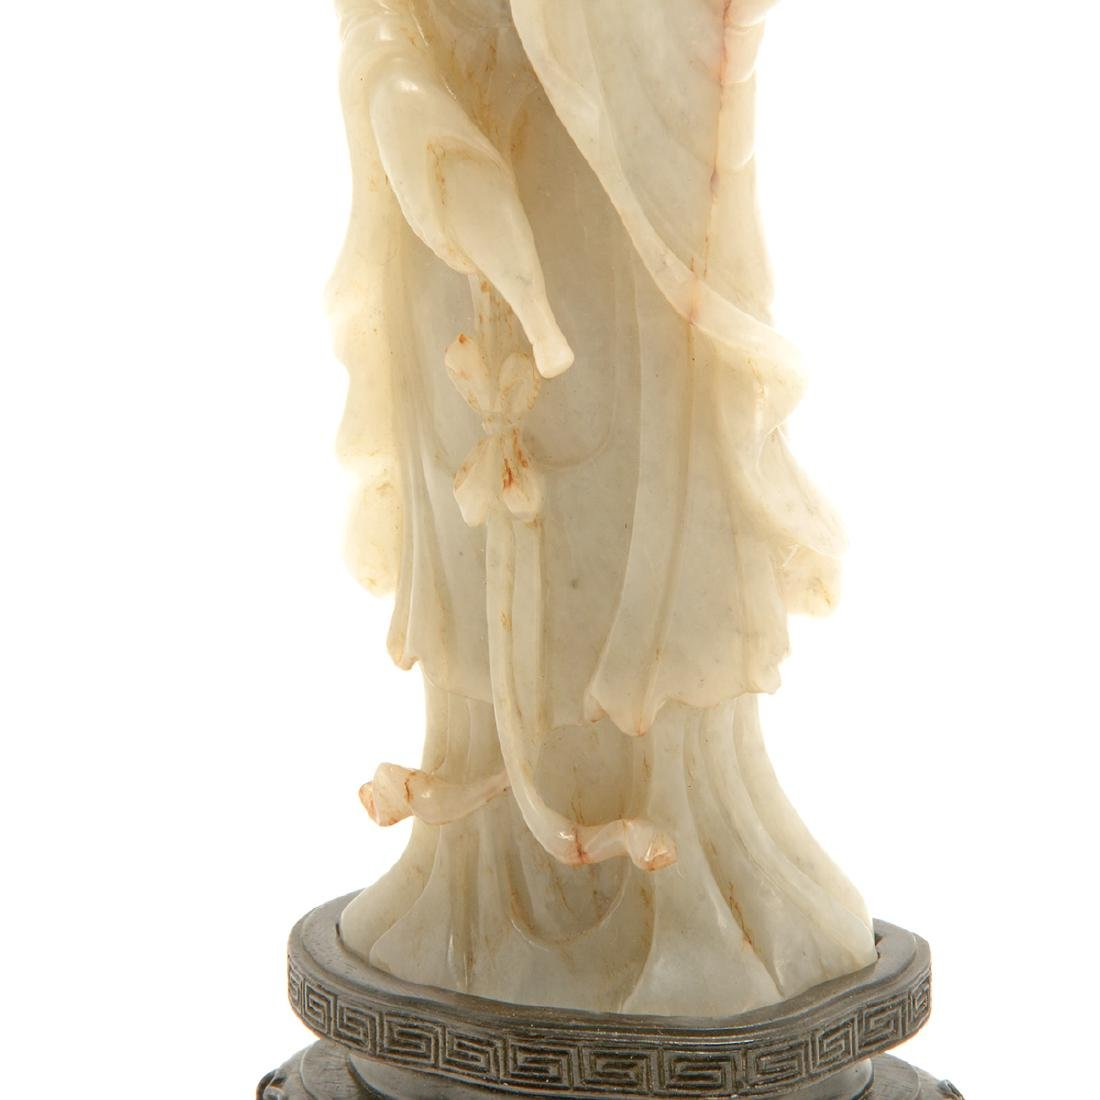 Jade Figure of Guanyin, Late Qing/Republic Period - 6